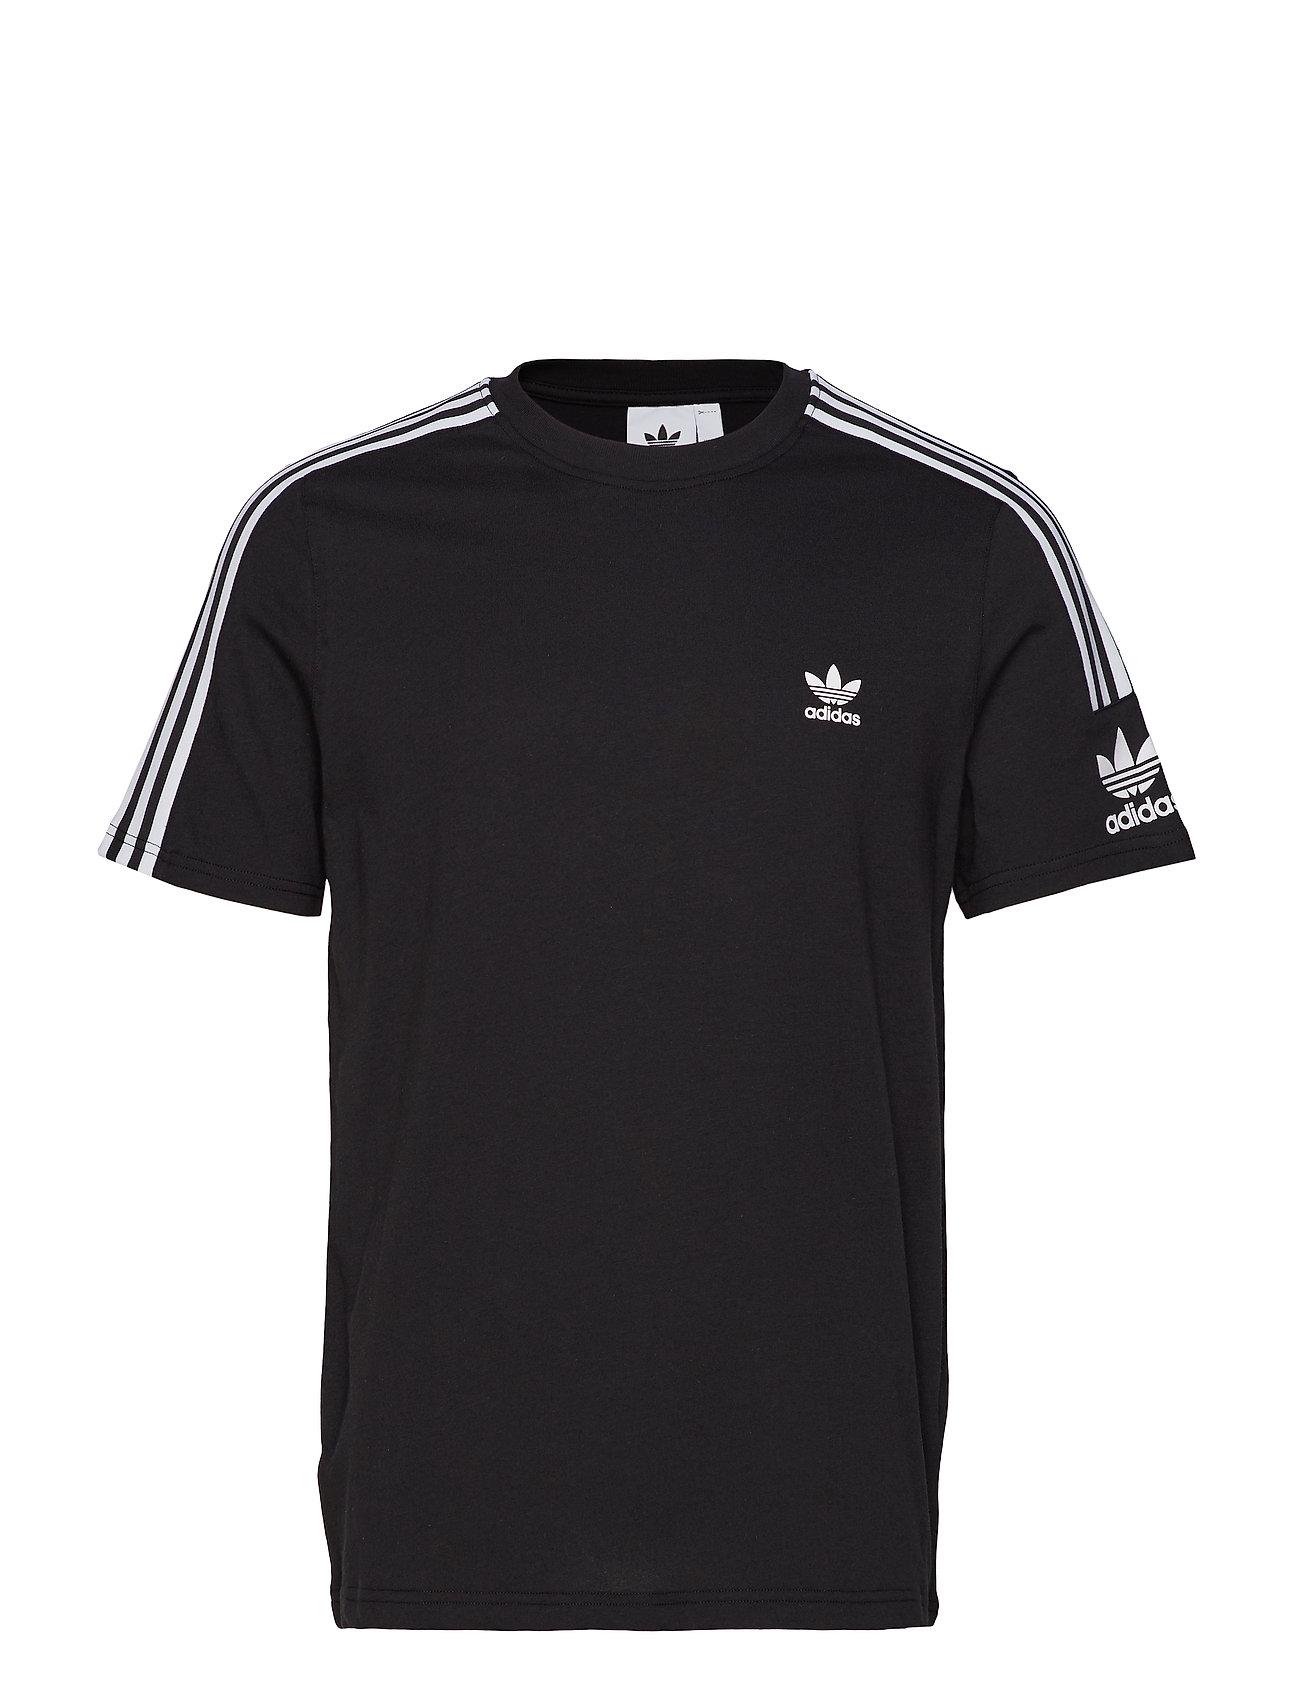 adidas Originals TECH TEE - BLACK